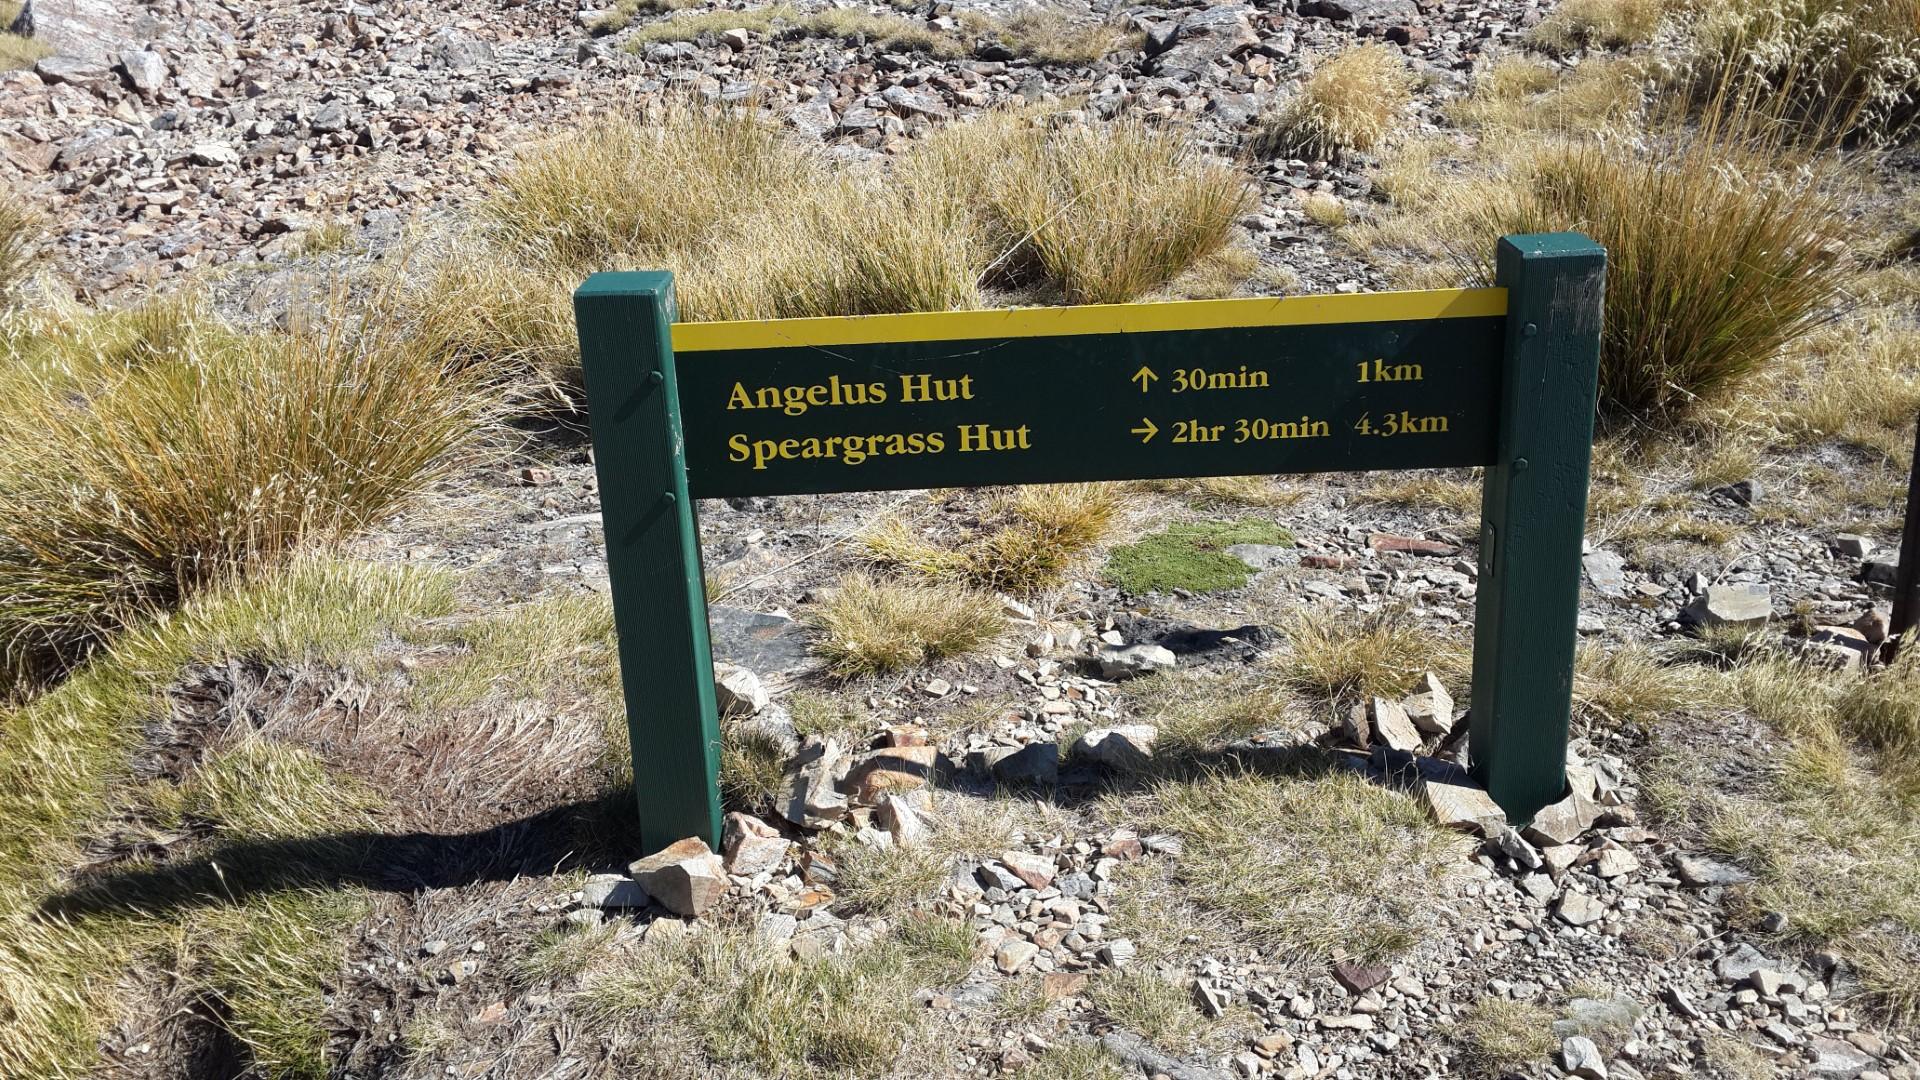 Angelus Hut